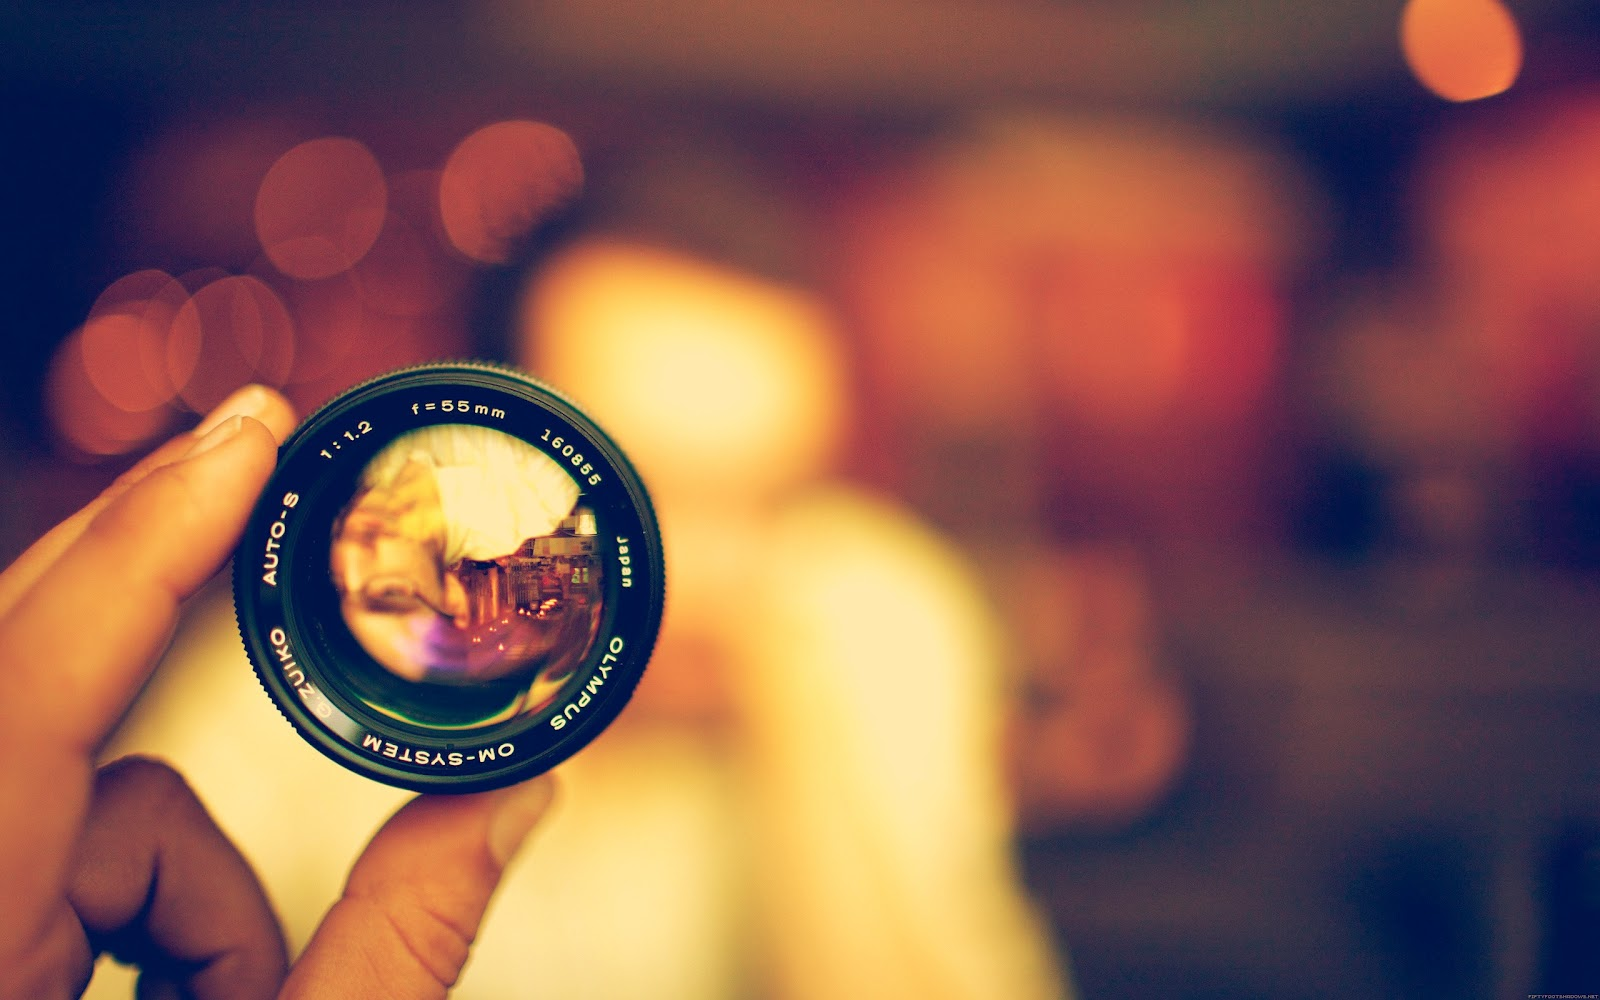 olympus lens light circles hd wallpaper | download hd wallpapers